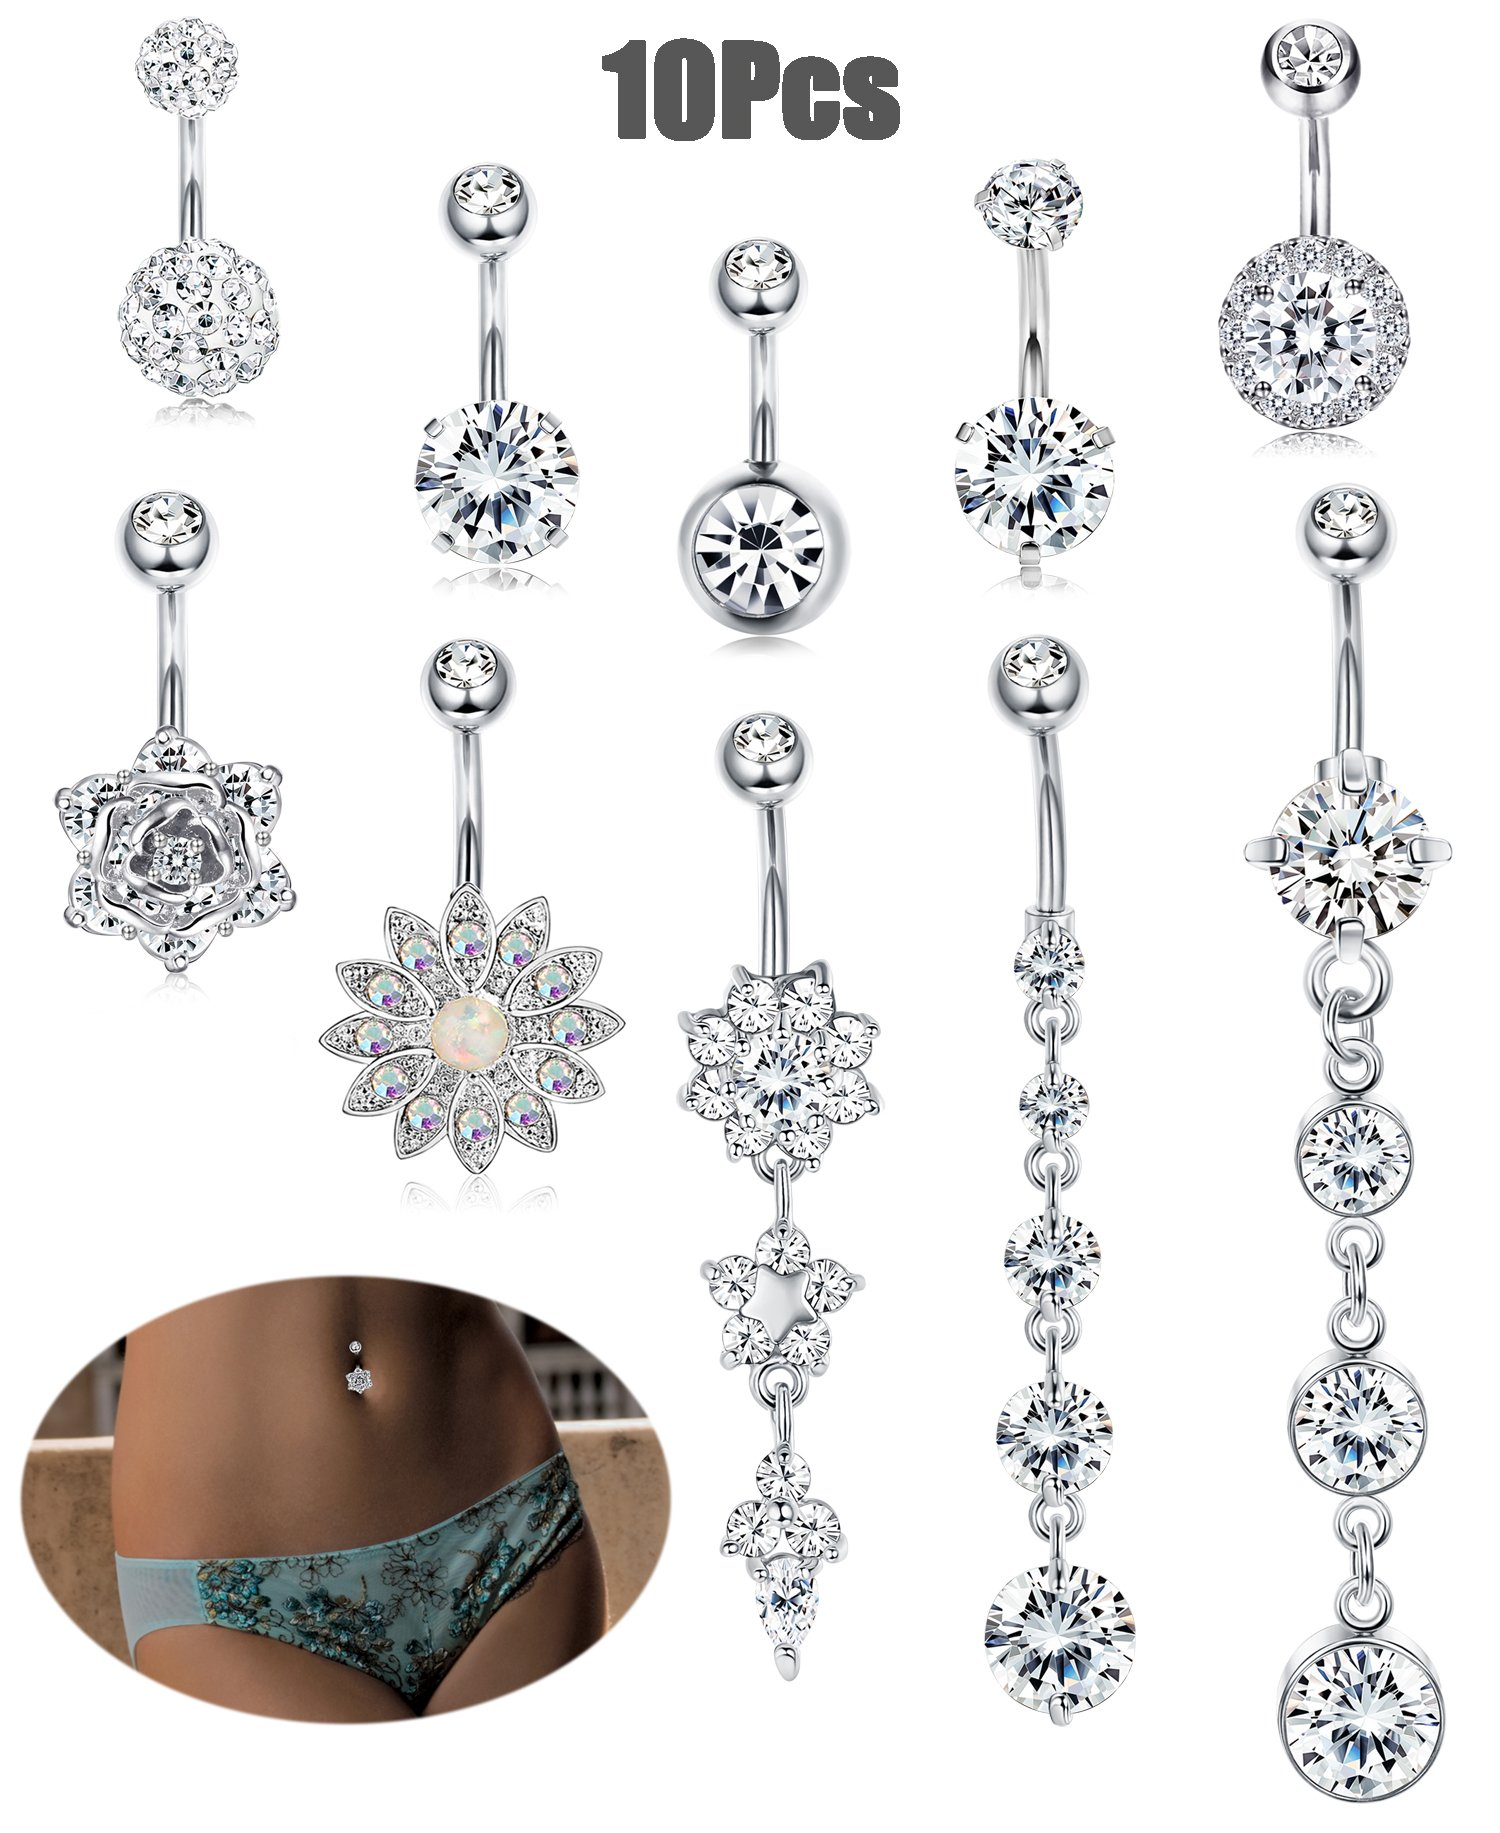 JOERICA 10Pcs 14G Stainless Steel Belly Button Rings for Women Flower Body Jewelry CZ Navel Piercing Silver-tone